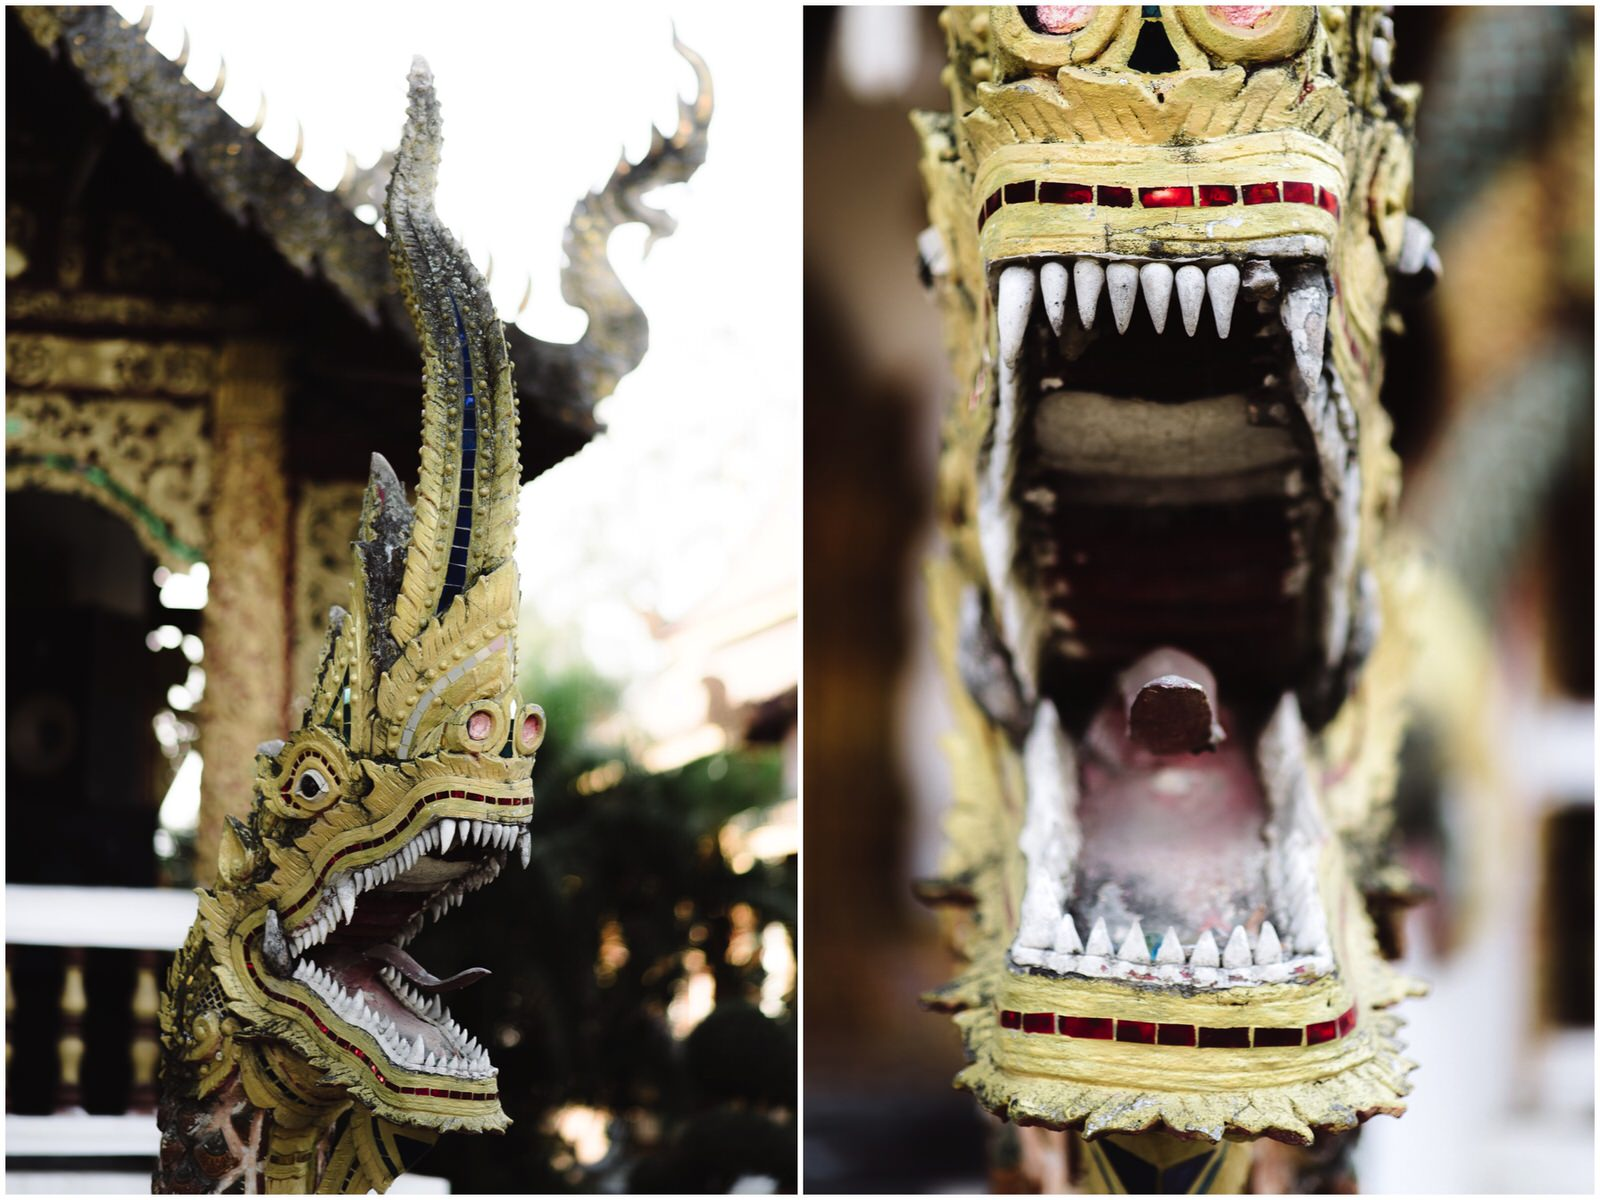 thaiblog2017-8-KOLL.jpg